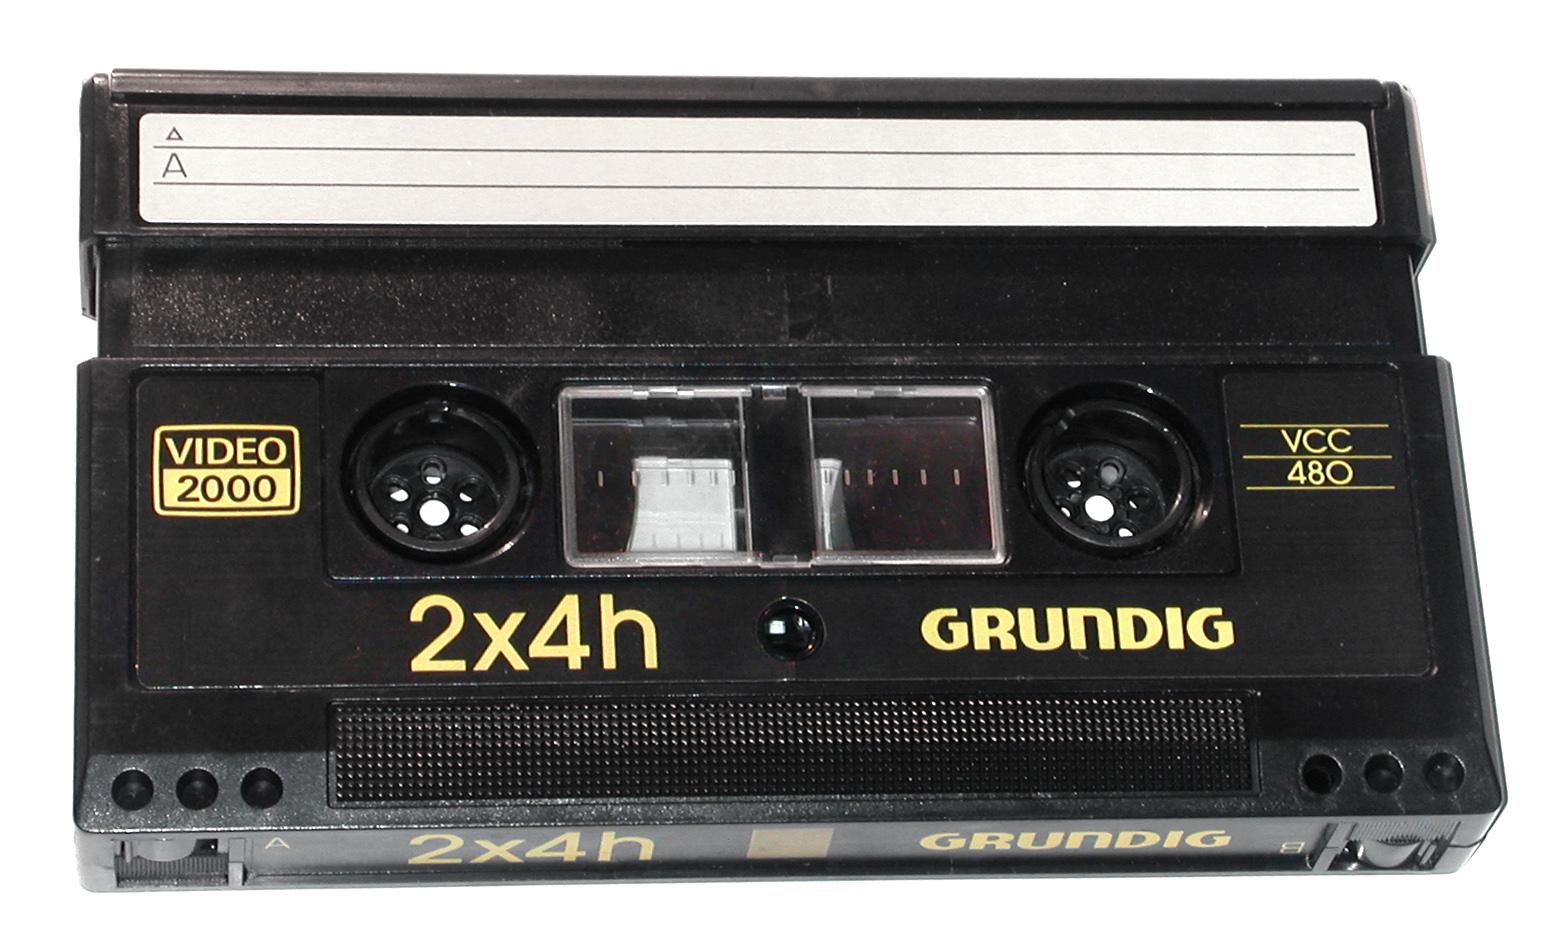 Video 2000 Format